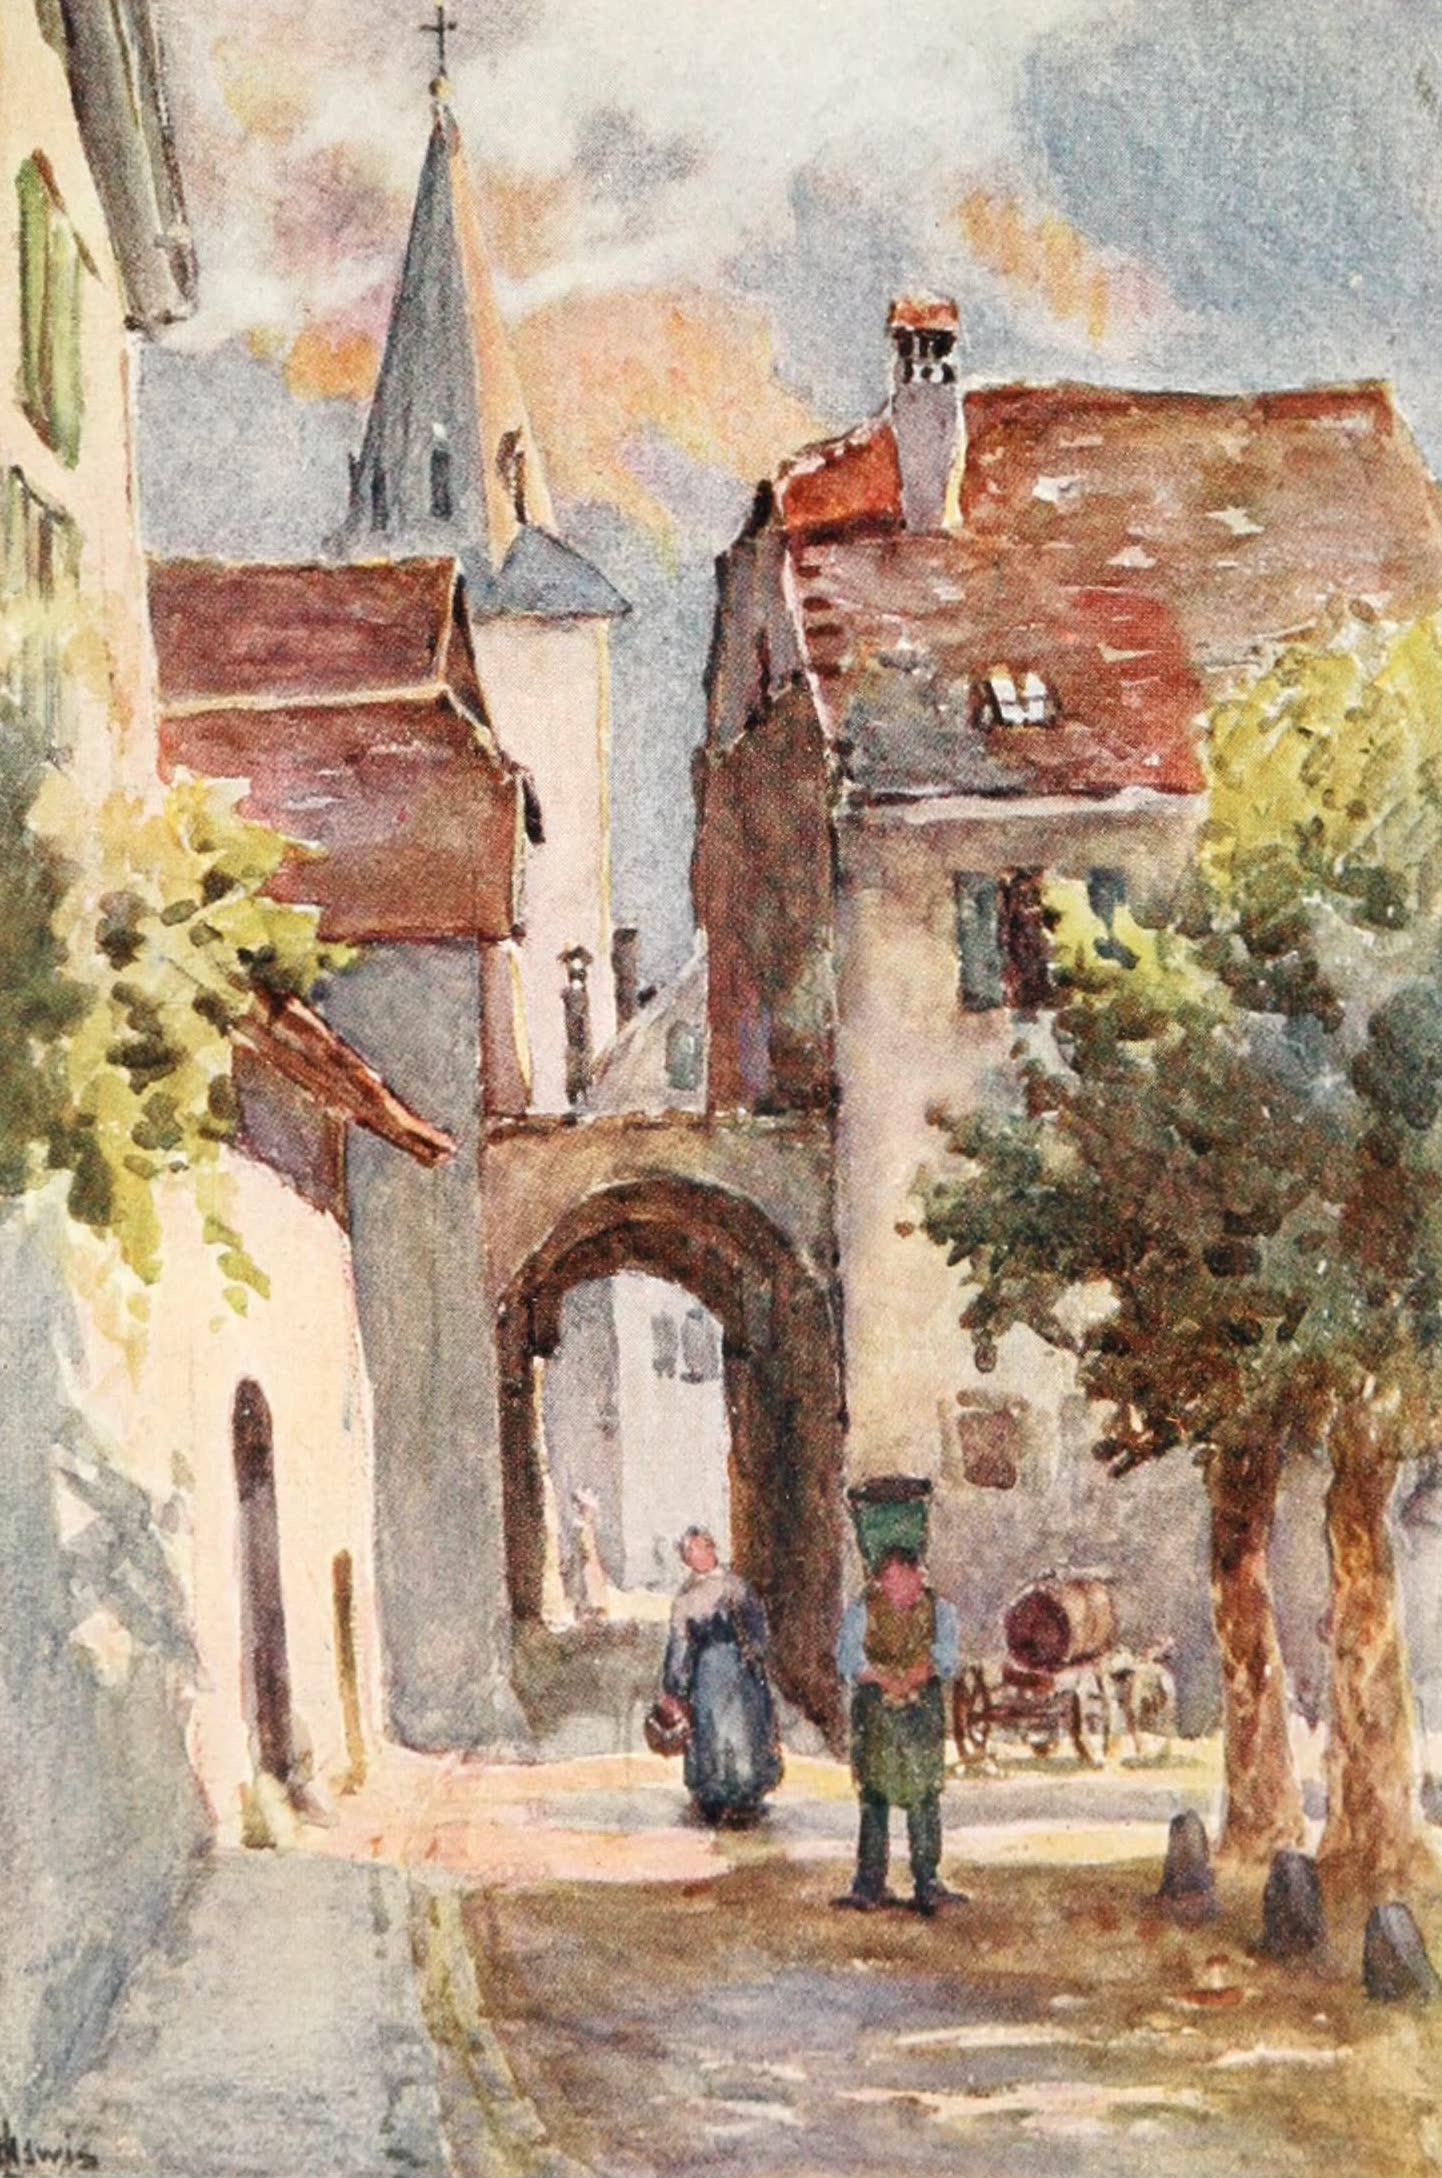 Montreux, Painted and Described - A Corner in Villeneuve (1908)